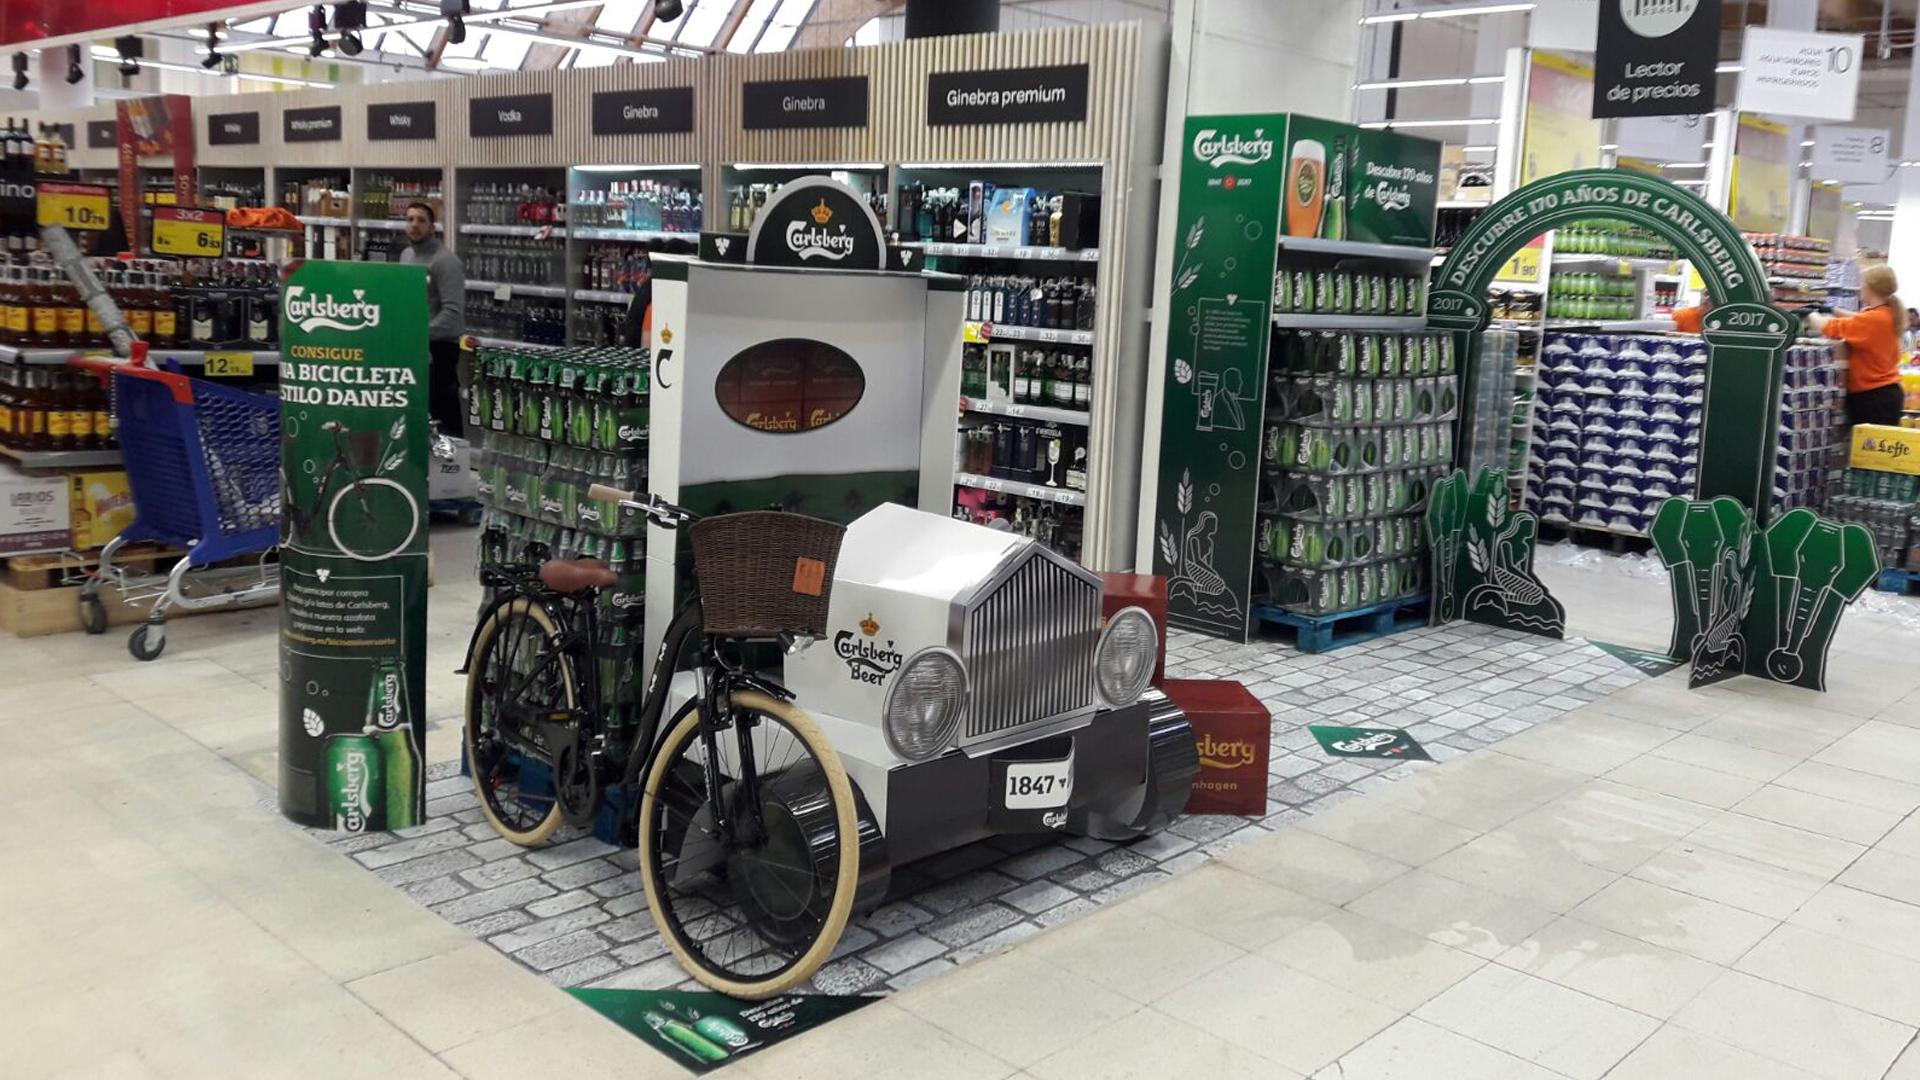 170 aniversario Carlsberg punto de venta Indigo